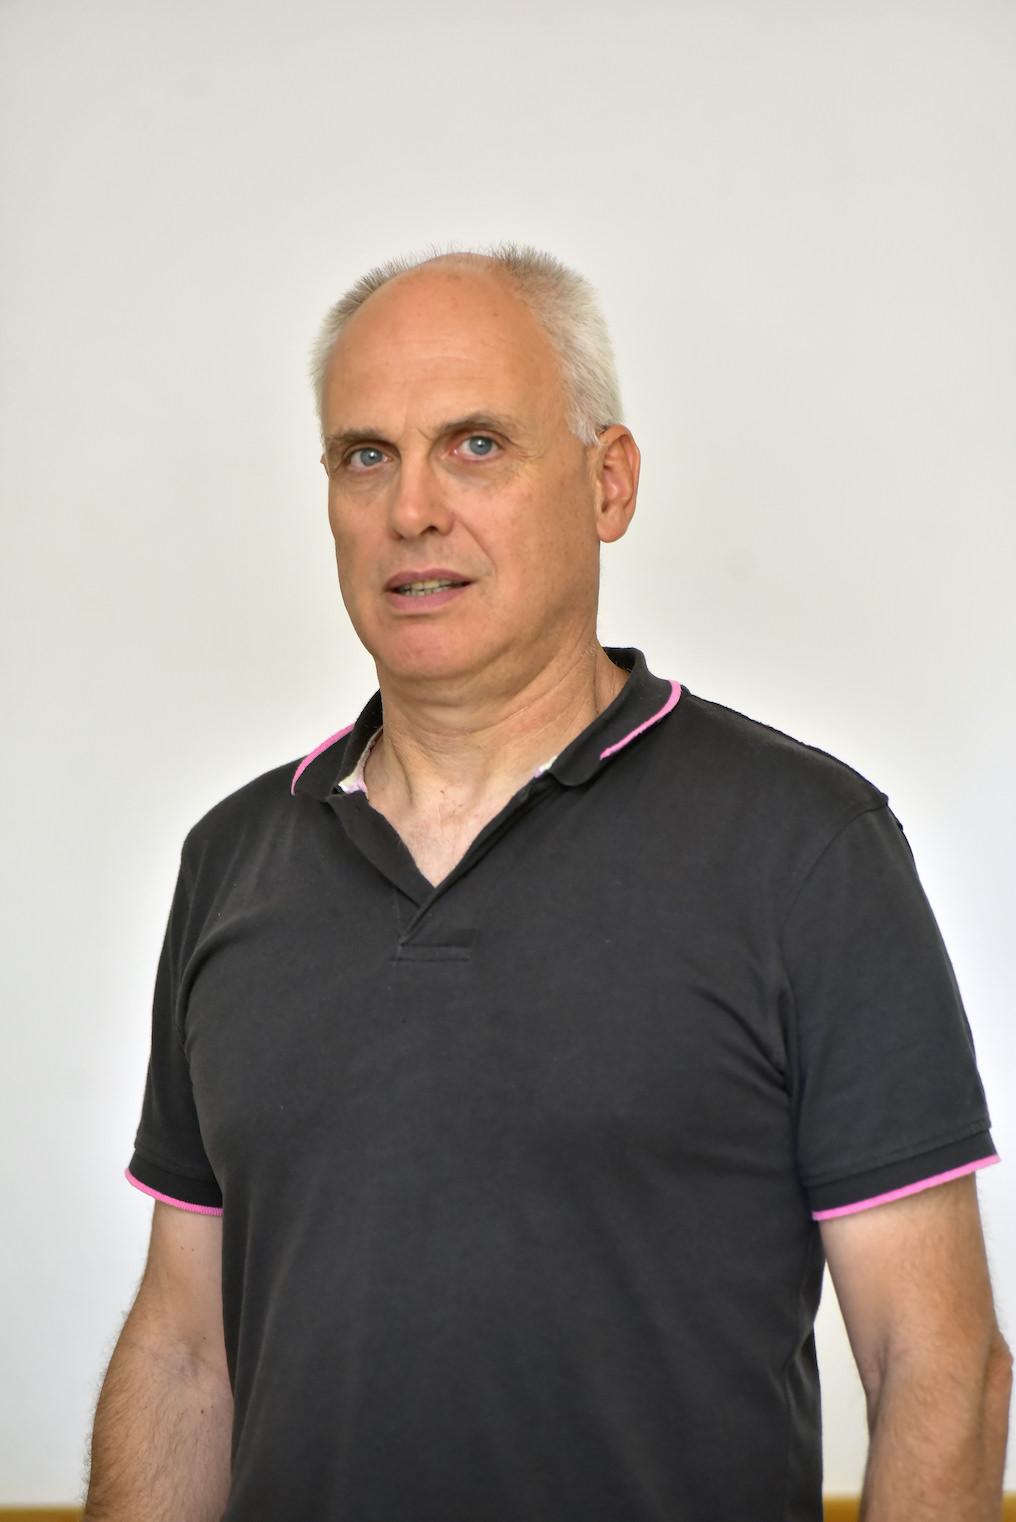 Adolfo Viollaz